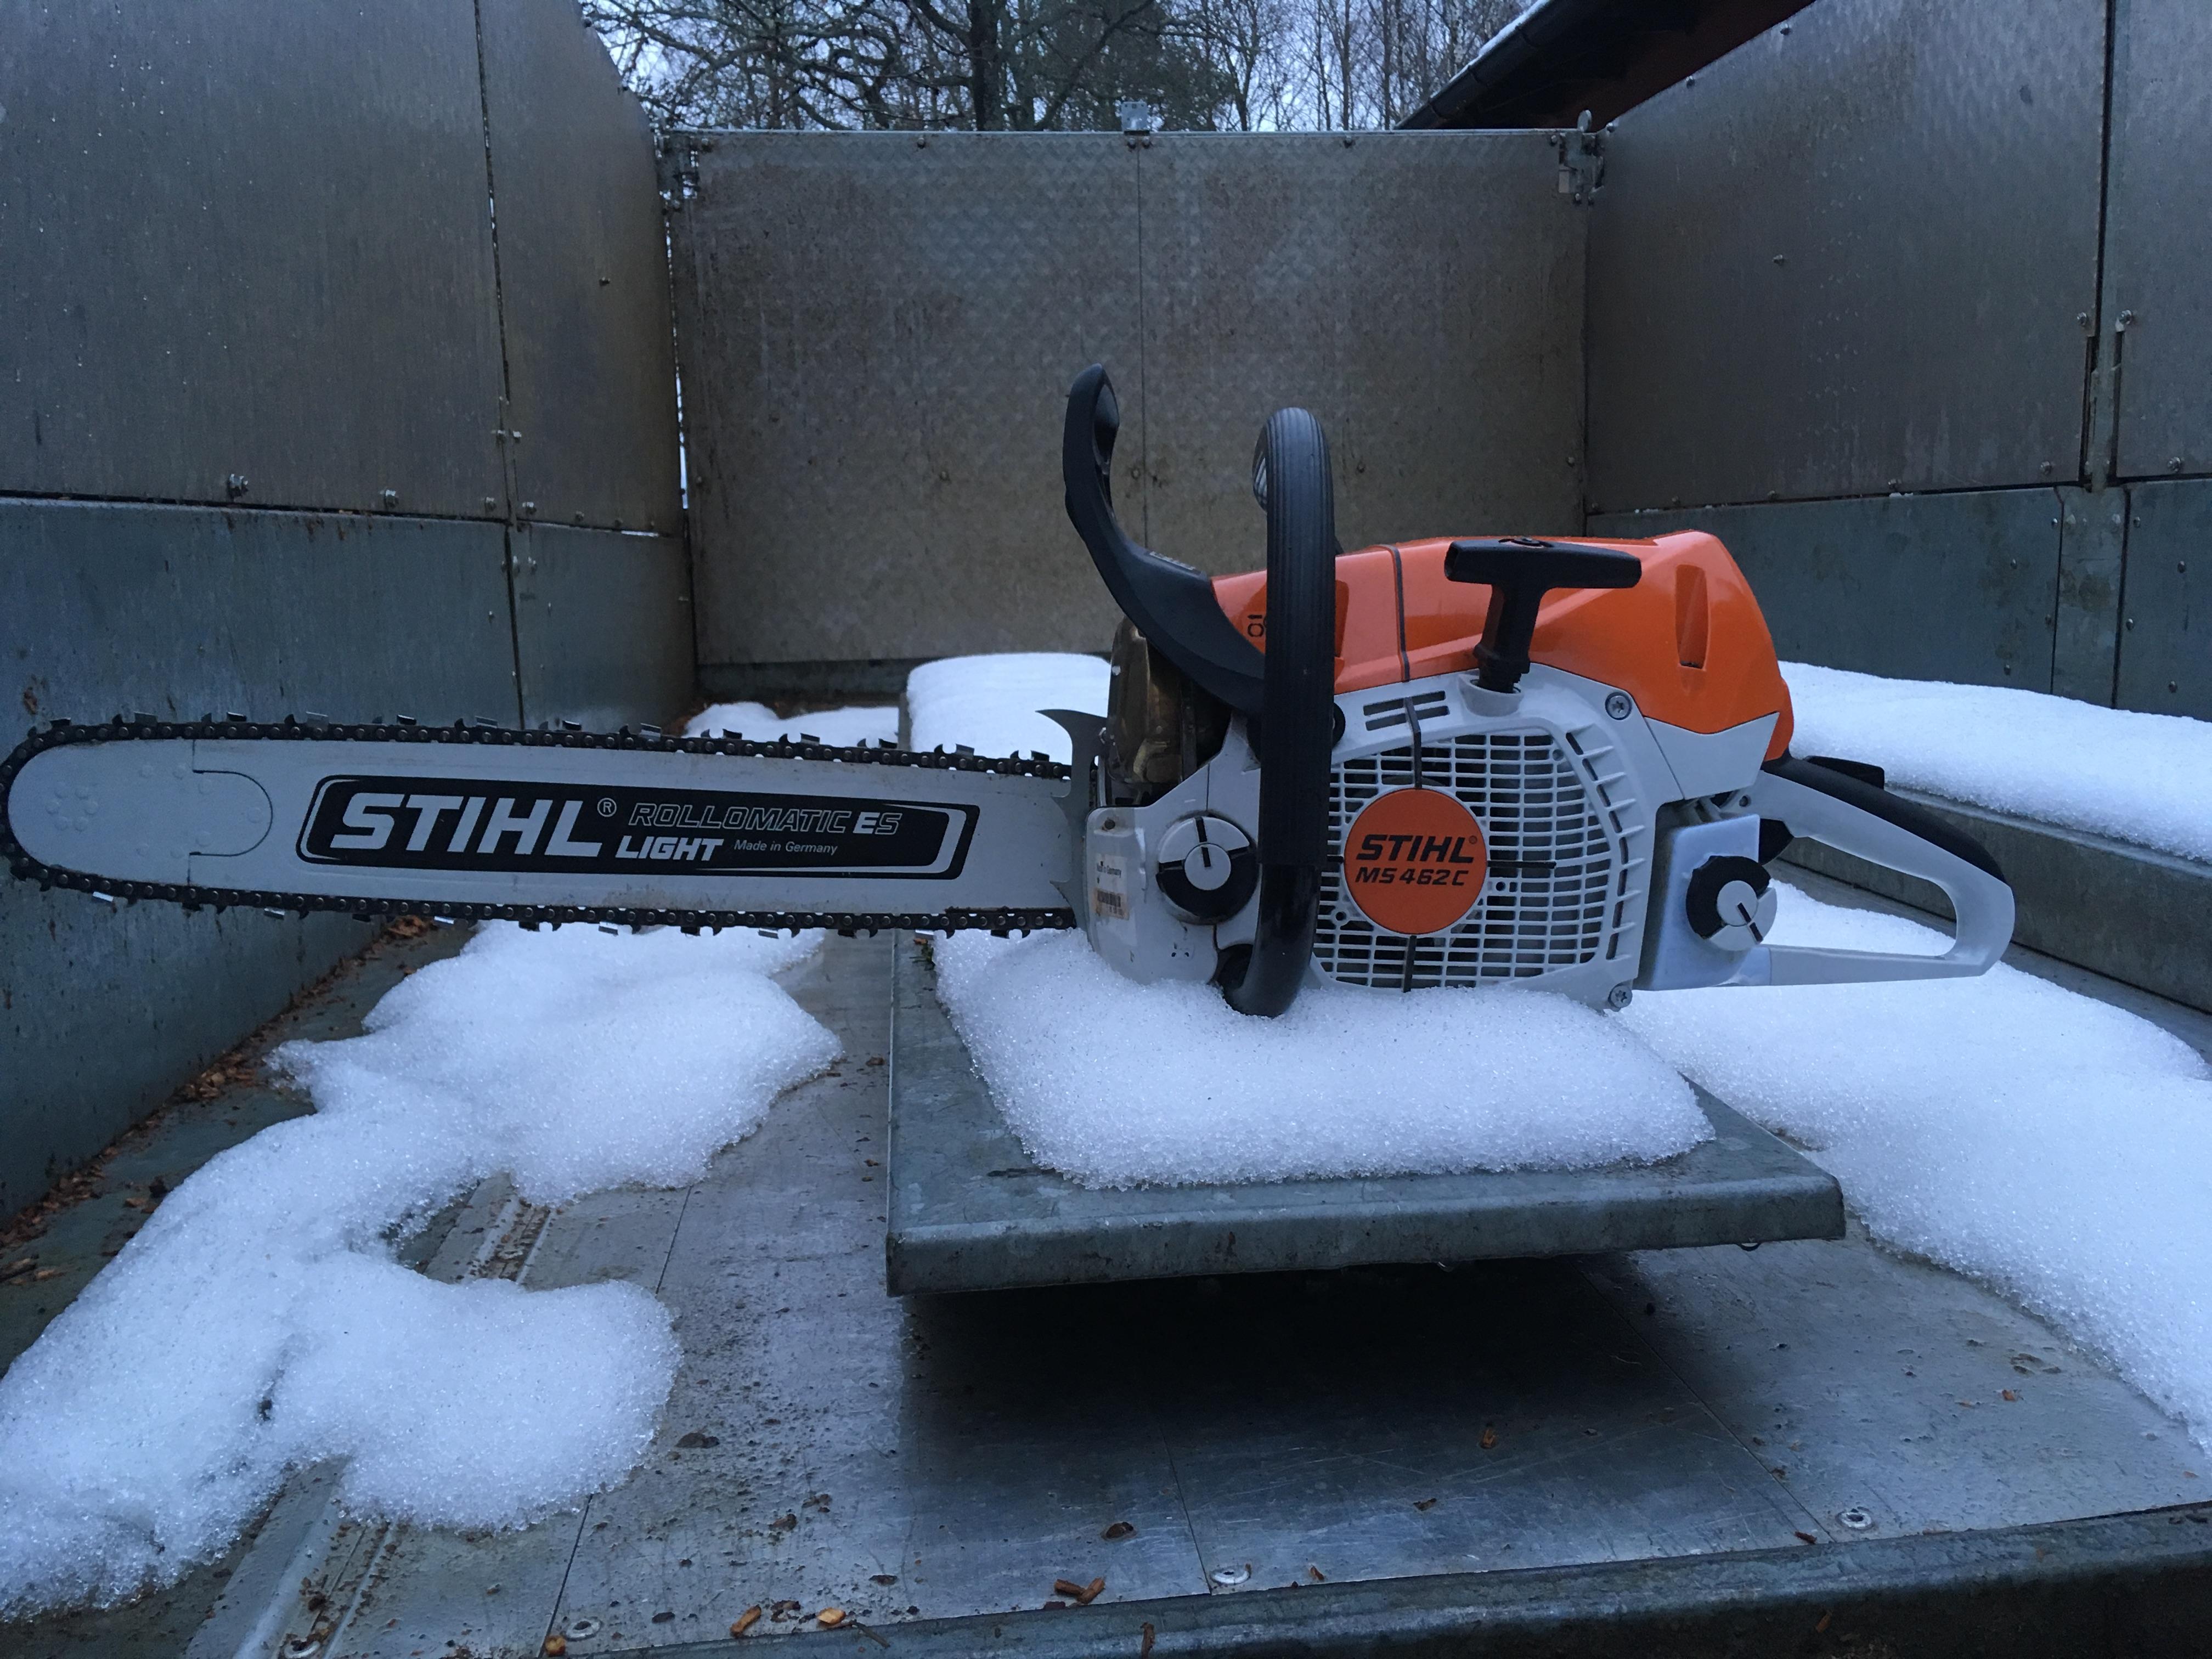 STIHL MS462 DUE NEXT SUMMER - Chainsaws - Arbtalk | The Social